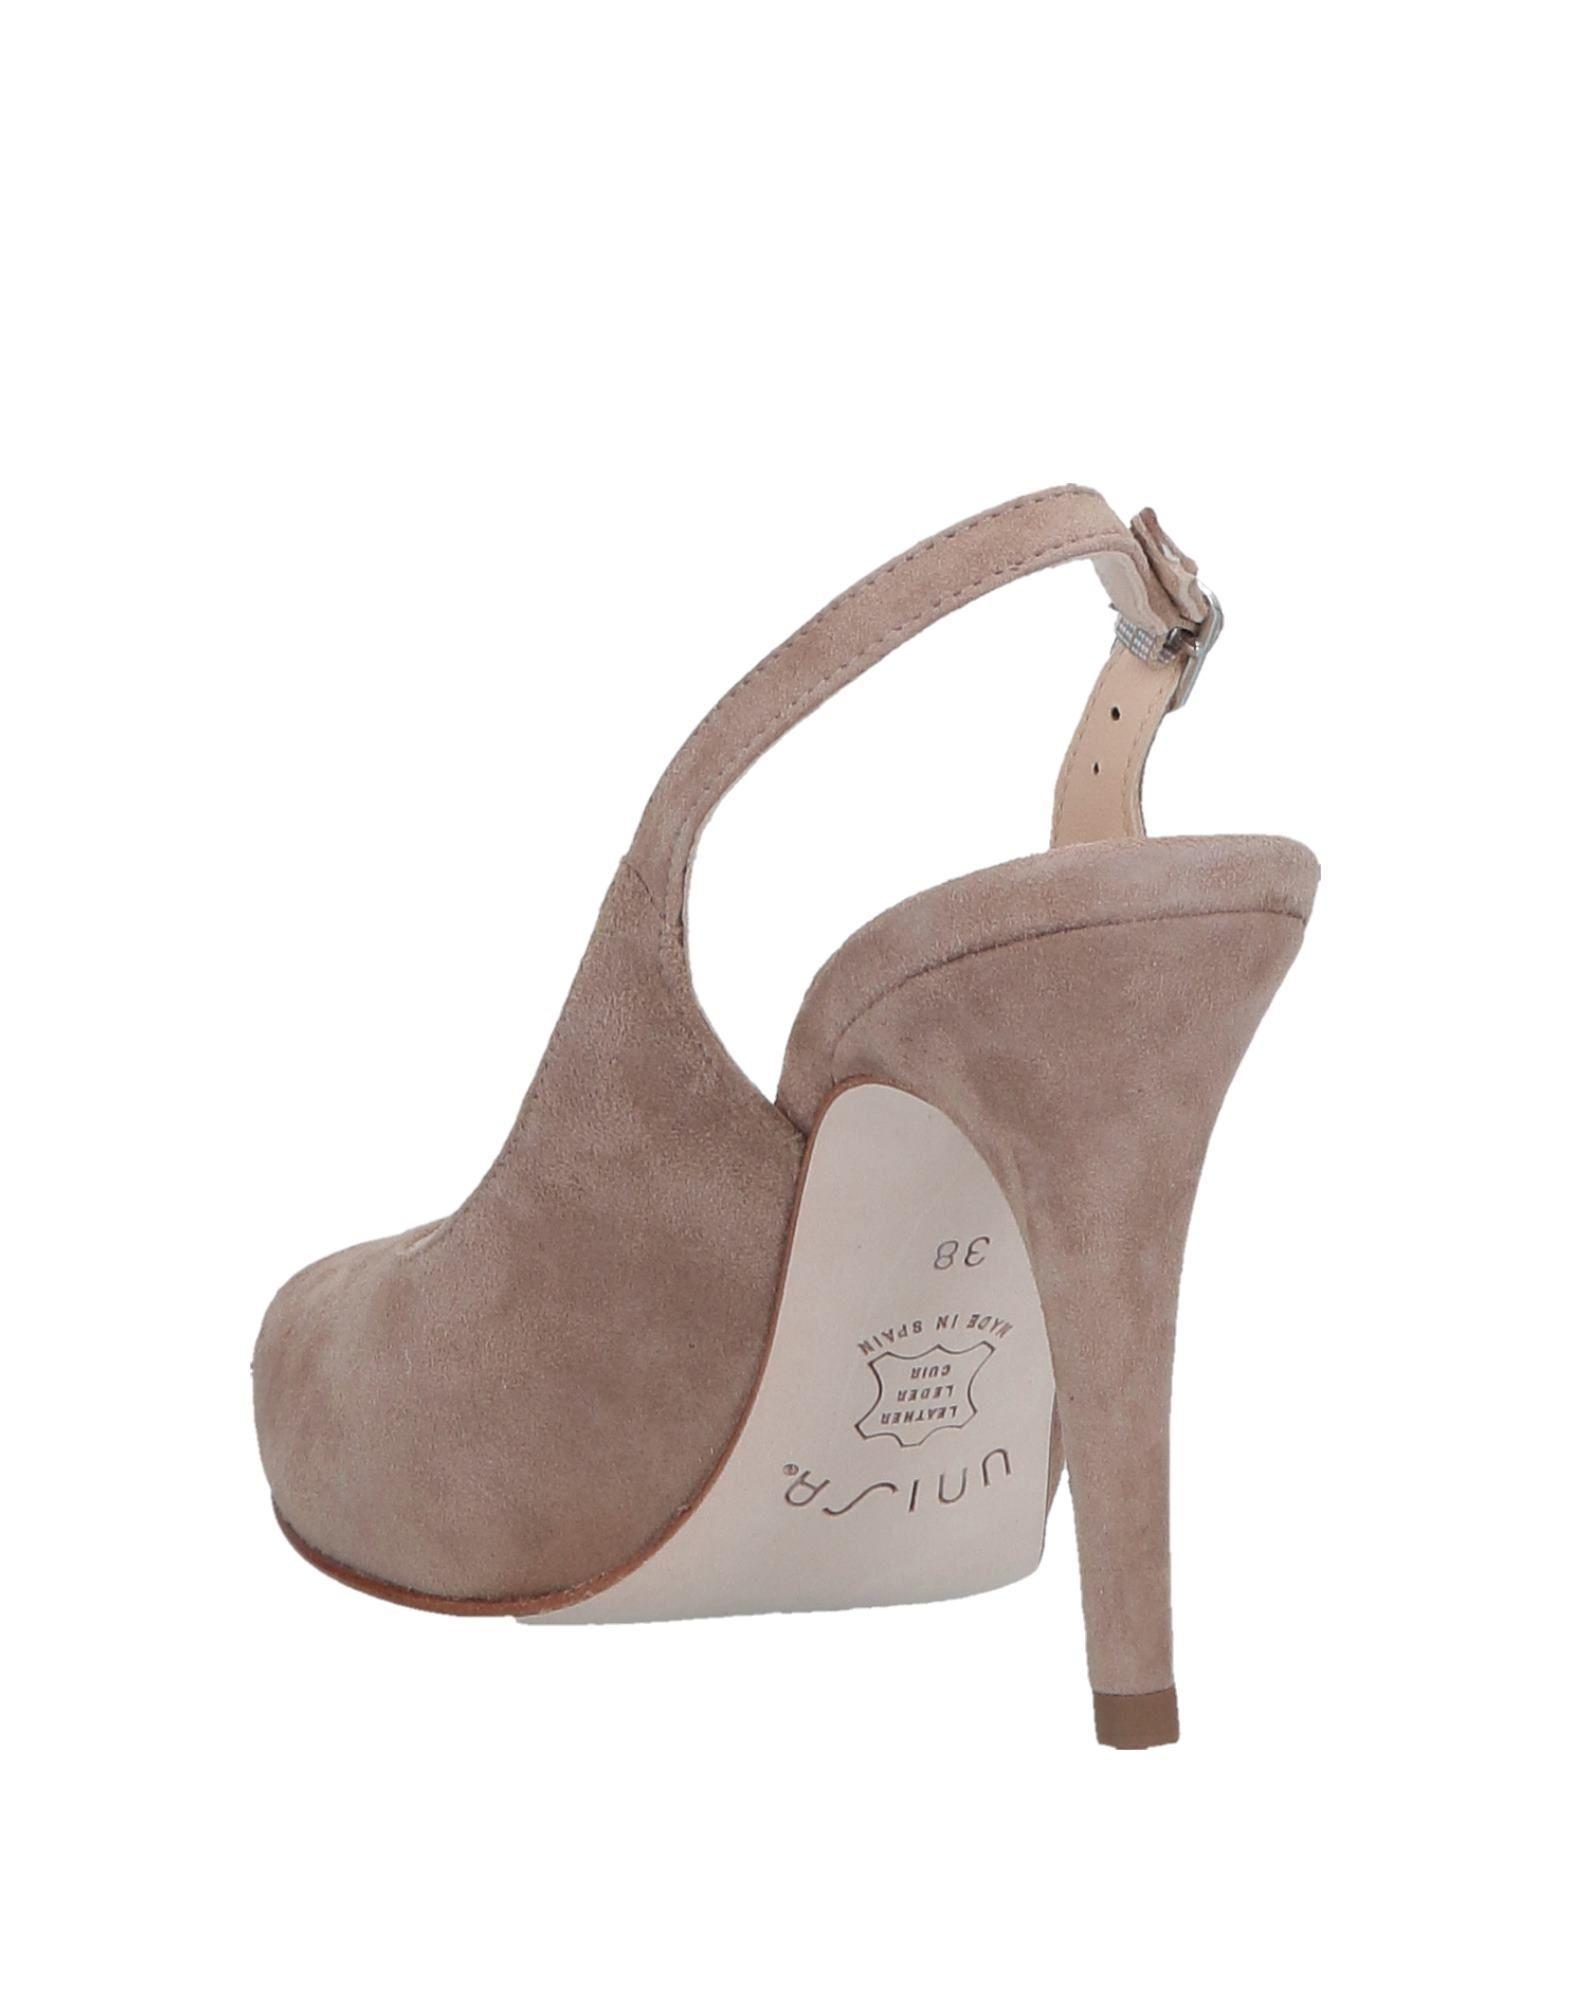 Unisa In Sandals In Lyst Brown Lyst Brown Sandals Lyst Unisa Sandals Unisa In LpqUzMSVG